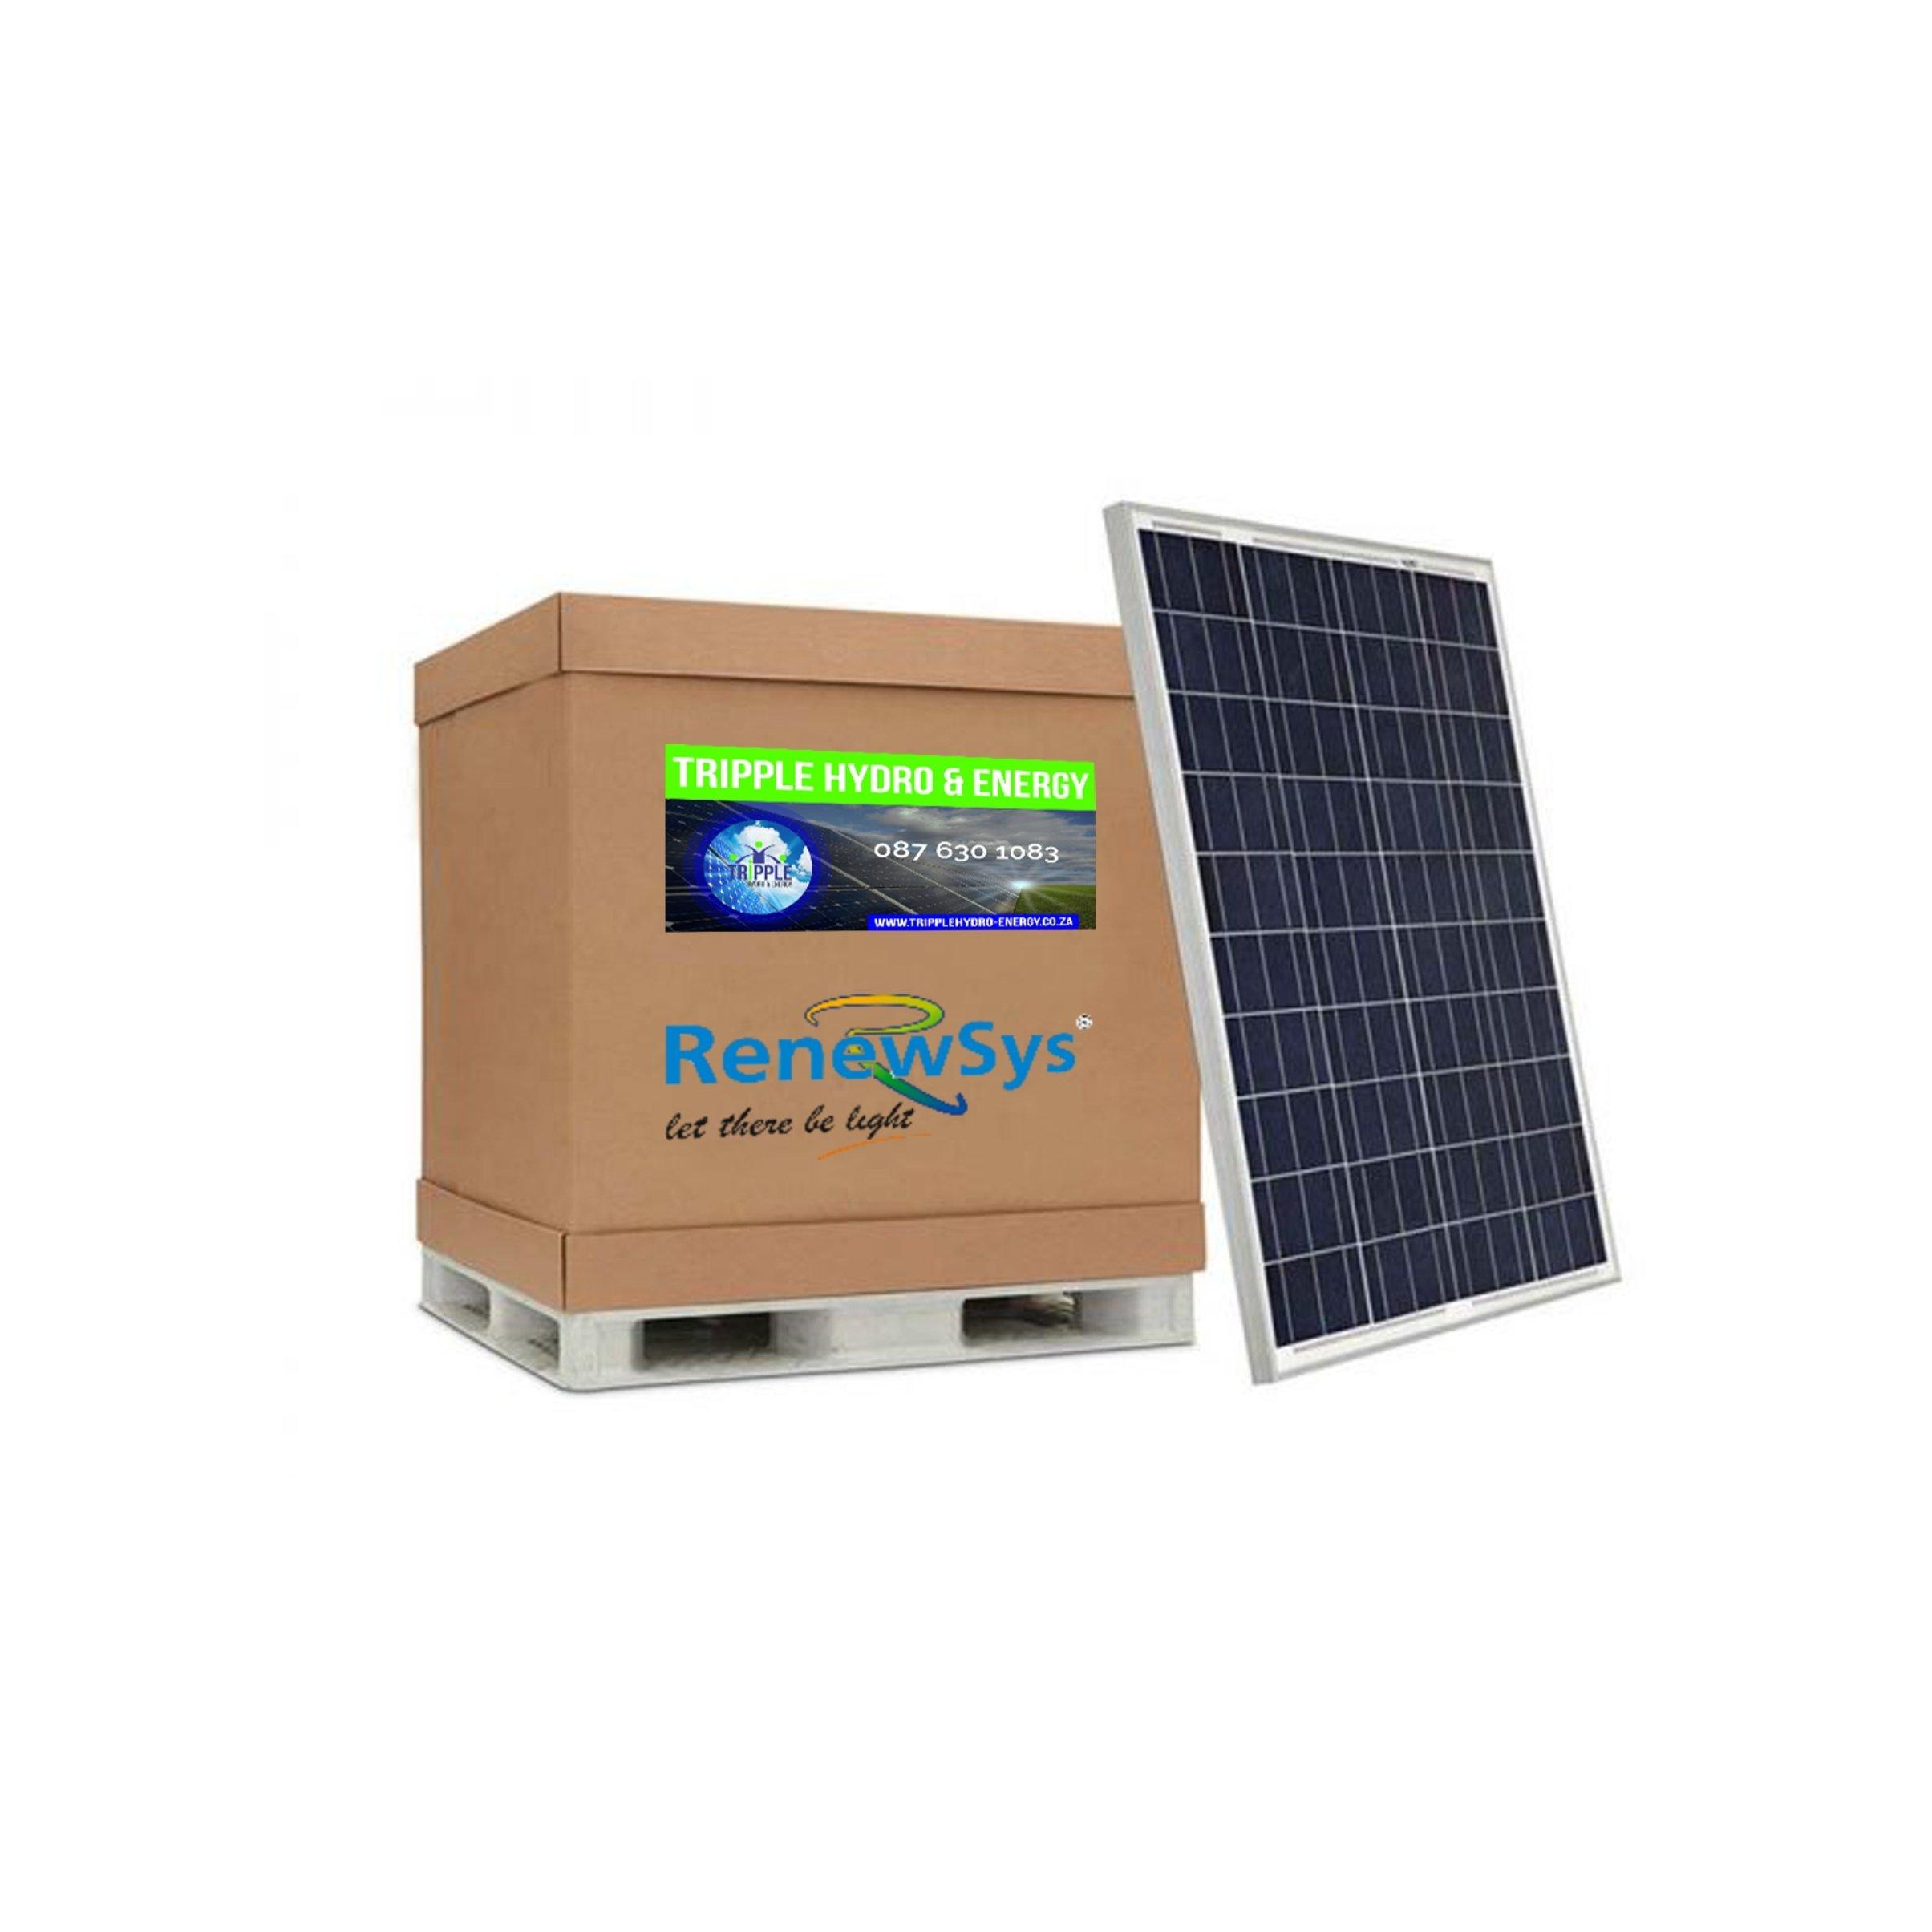 Renewsys 300 Watt Solar Panel (High Voltage) Pallet of 26 P-REN-300WPRIME PC-26